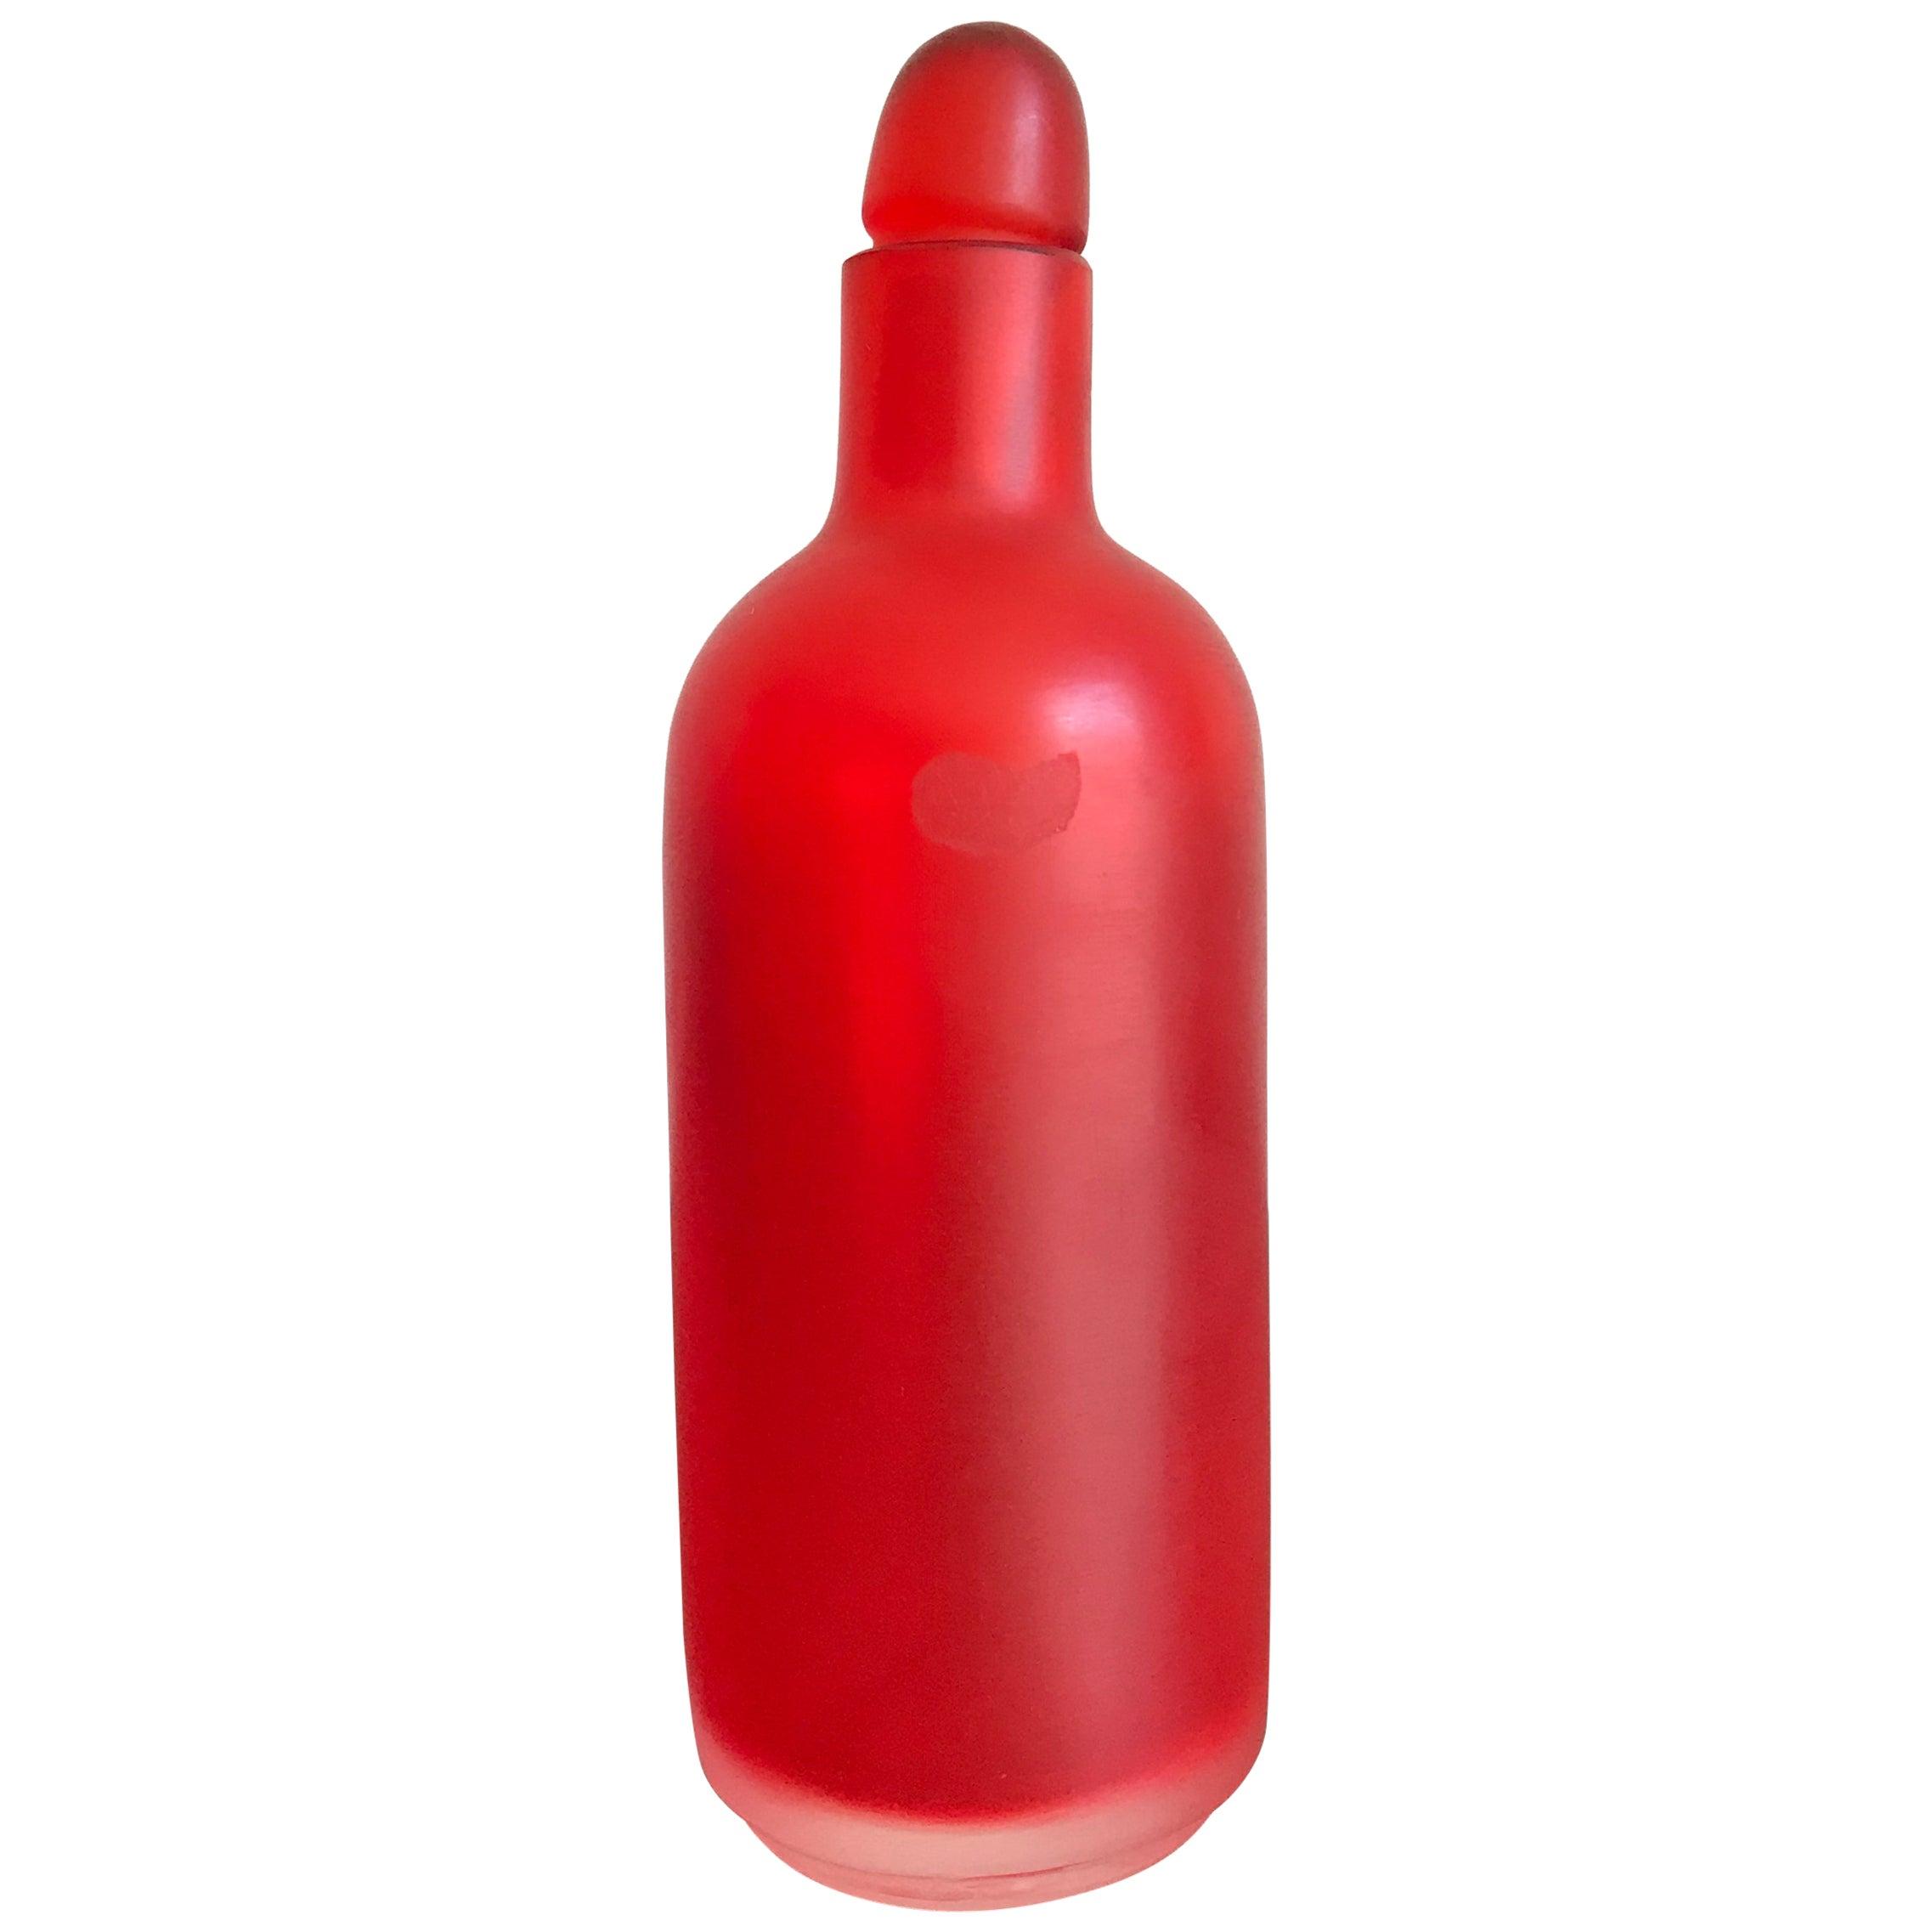 "Venini Murano Italy Glass Red Bottle Serie ""Velati"", 1995"